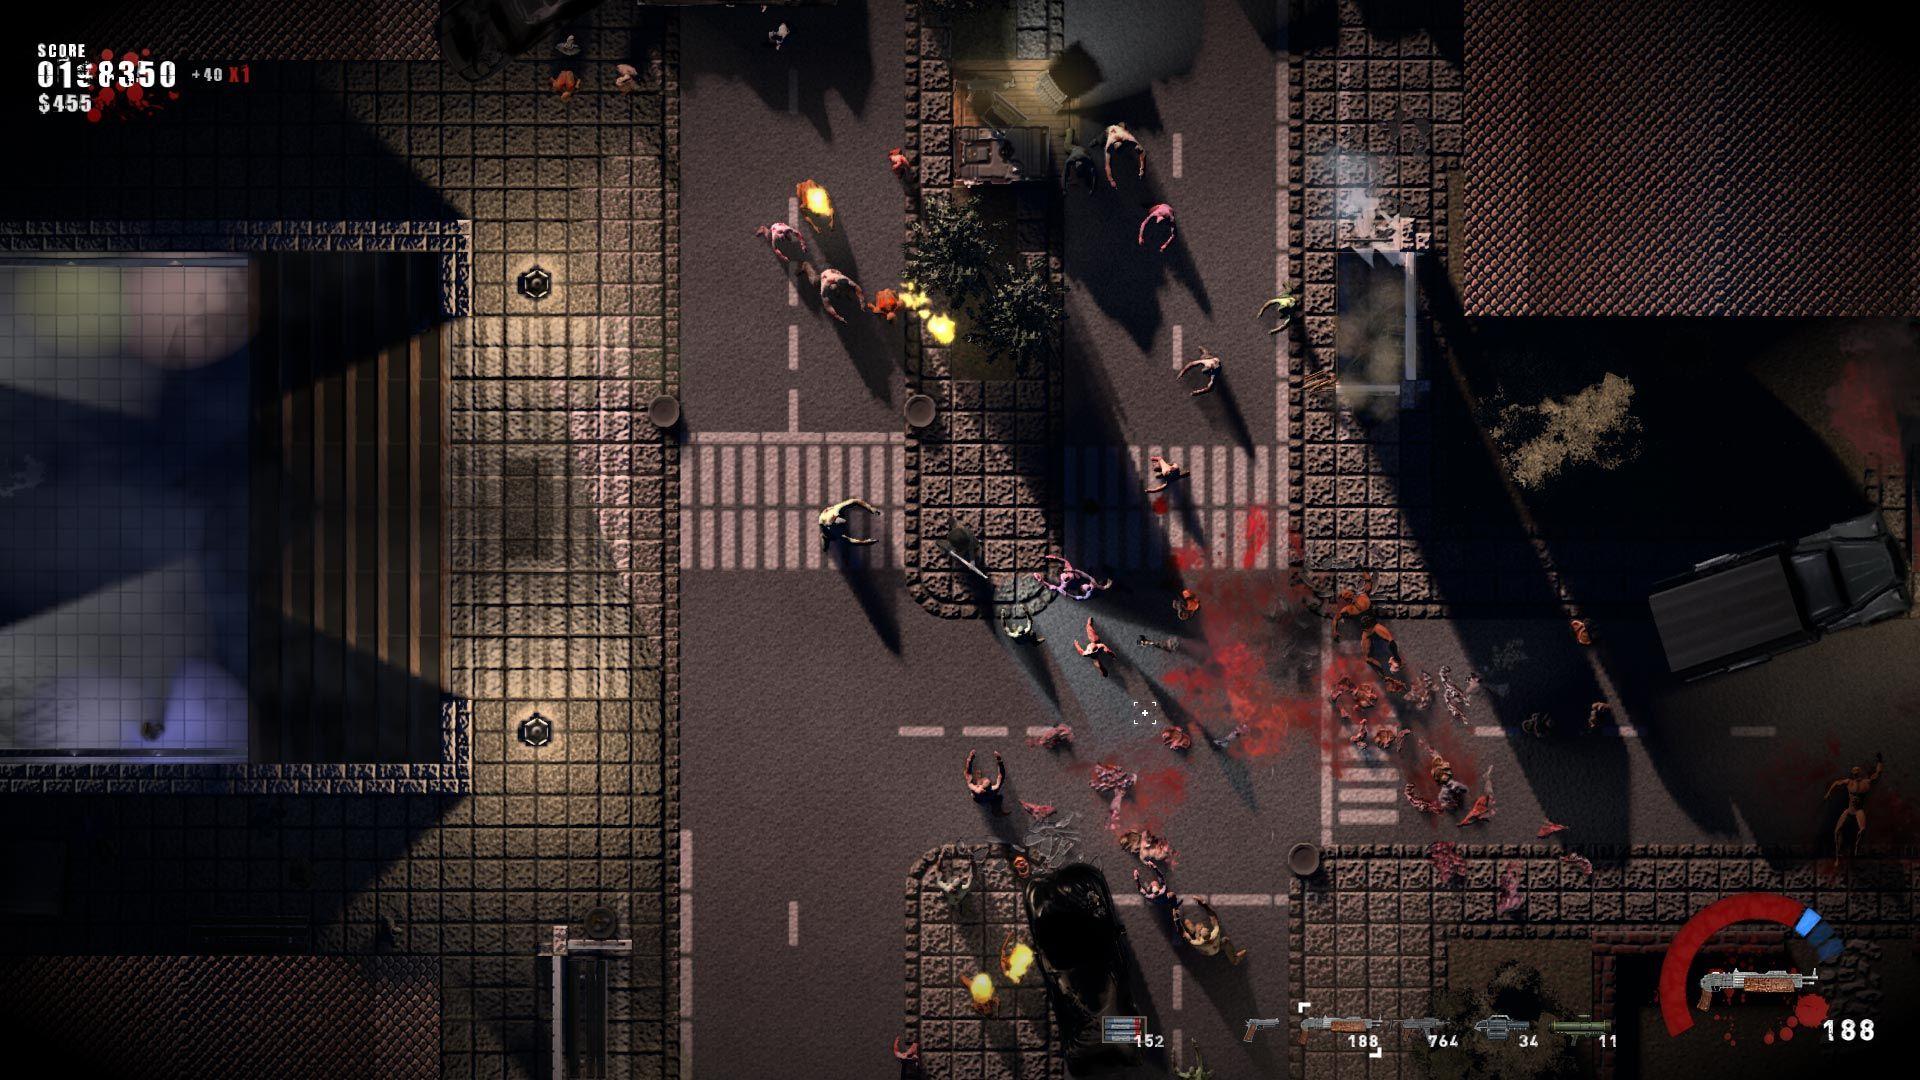 TopDownShooter, FilmNoir, Indie Game, Splatter and